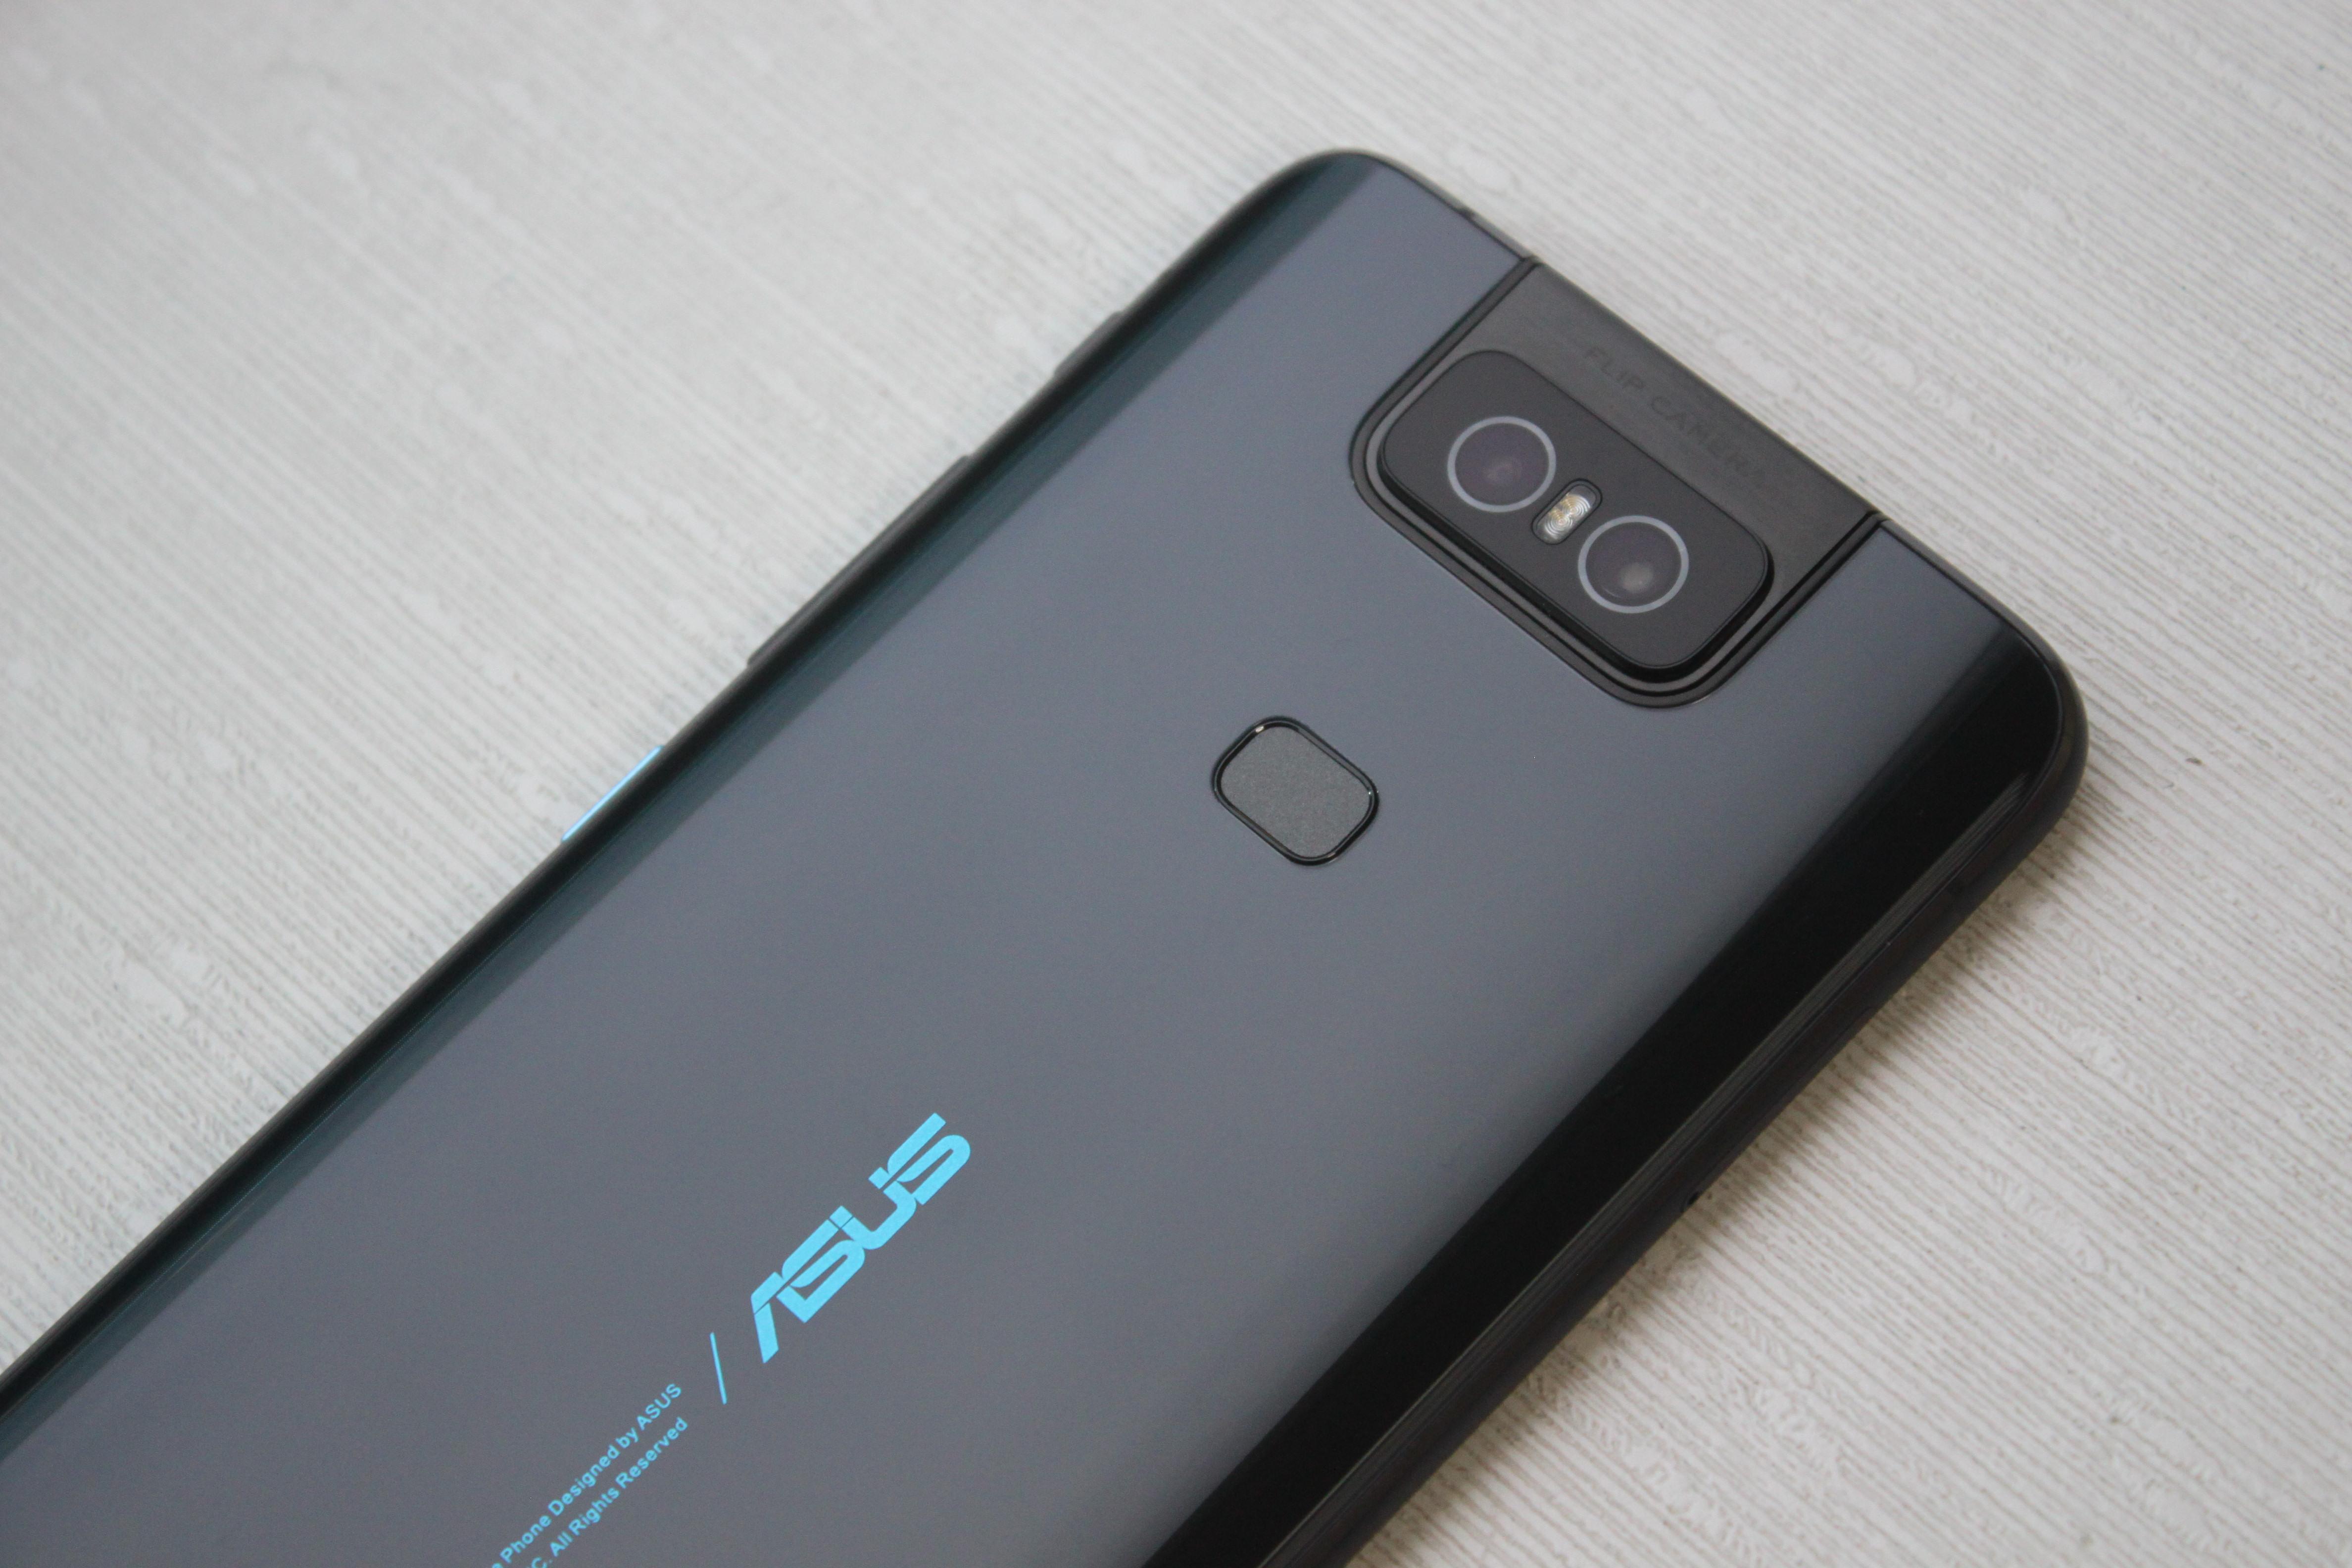 Zenfone 6 背蓋設計與指紋辨識